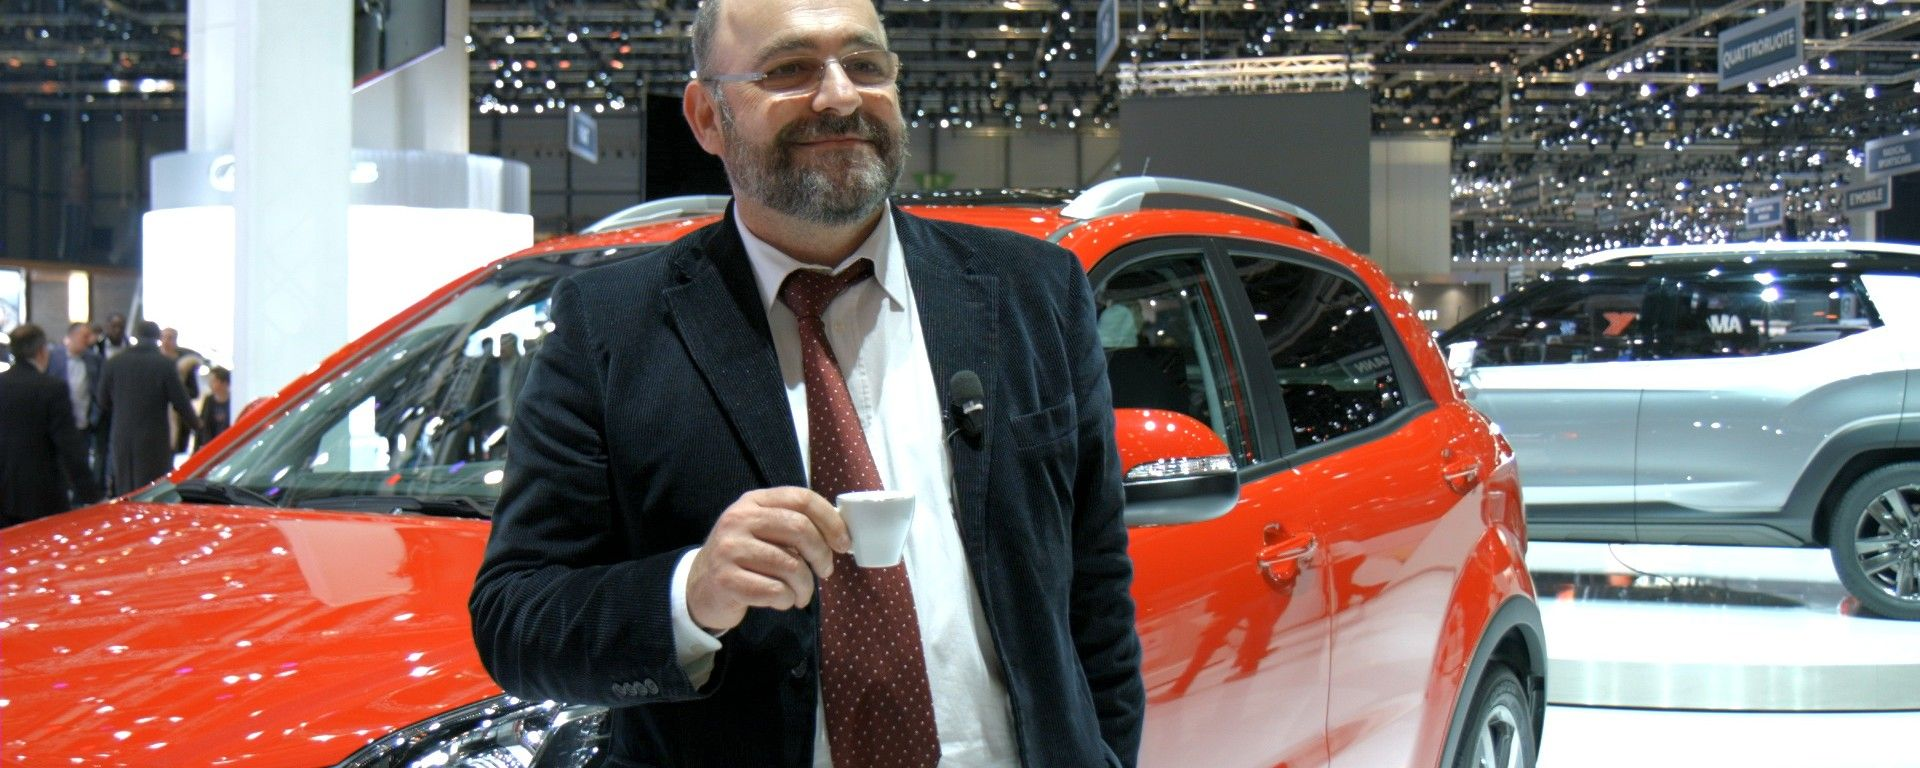 Maurizio Melzi, Brand Manager di SsangYong Italia